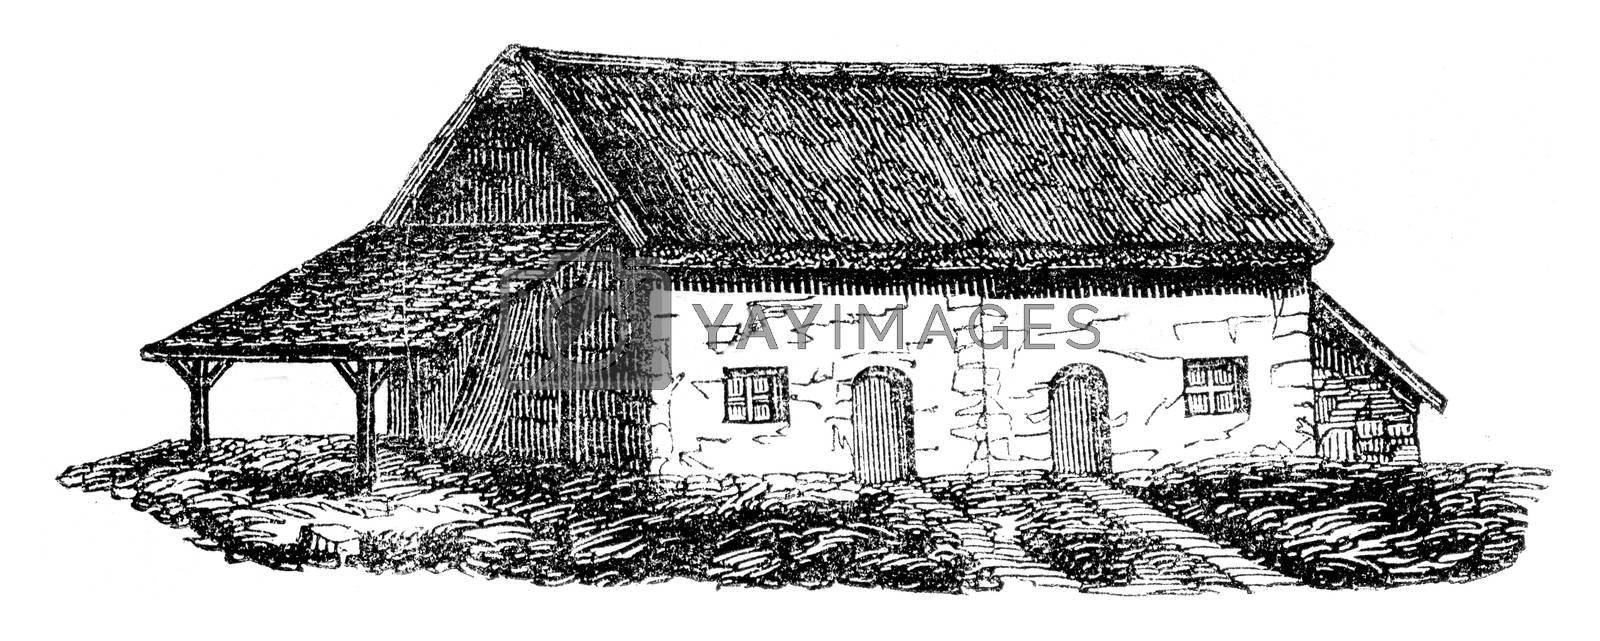 Department of North Cotes, Large farm back 500 francs, vintage engraved illustration. Magasin Pittoresque 1845.